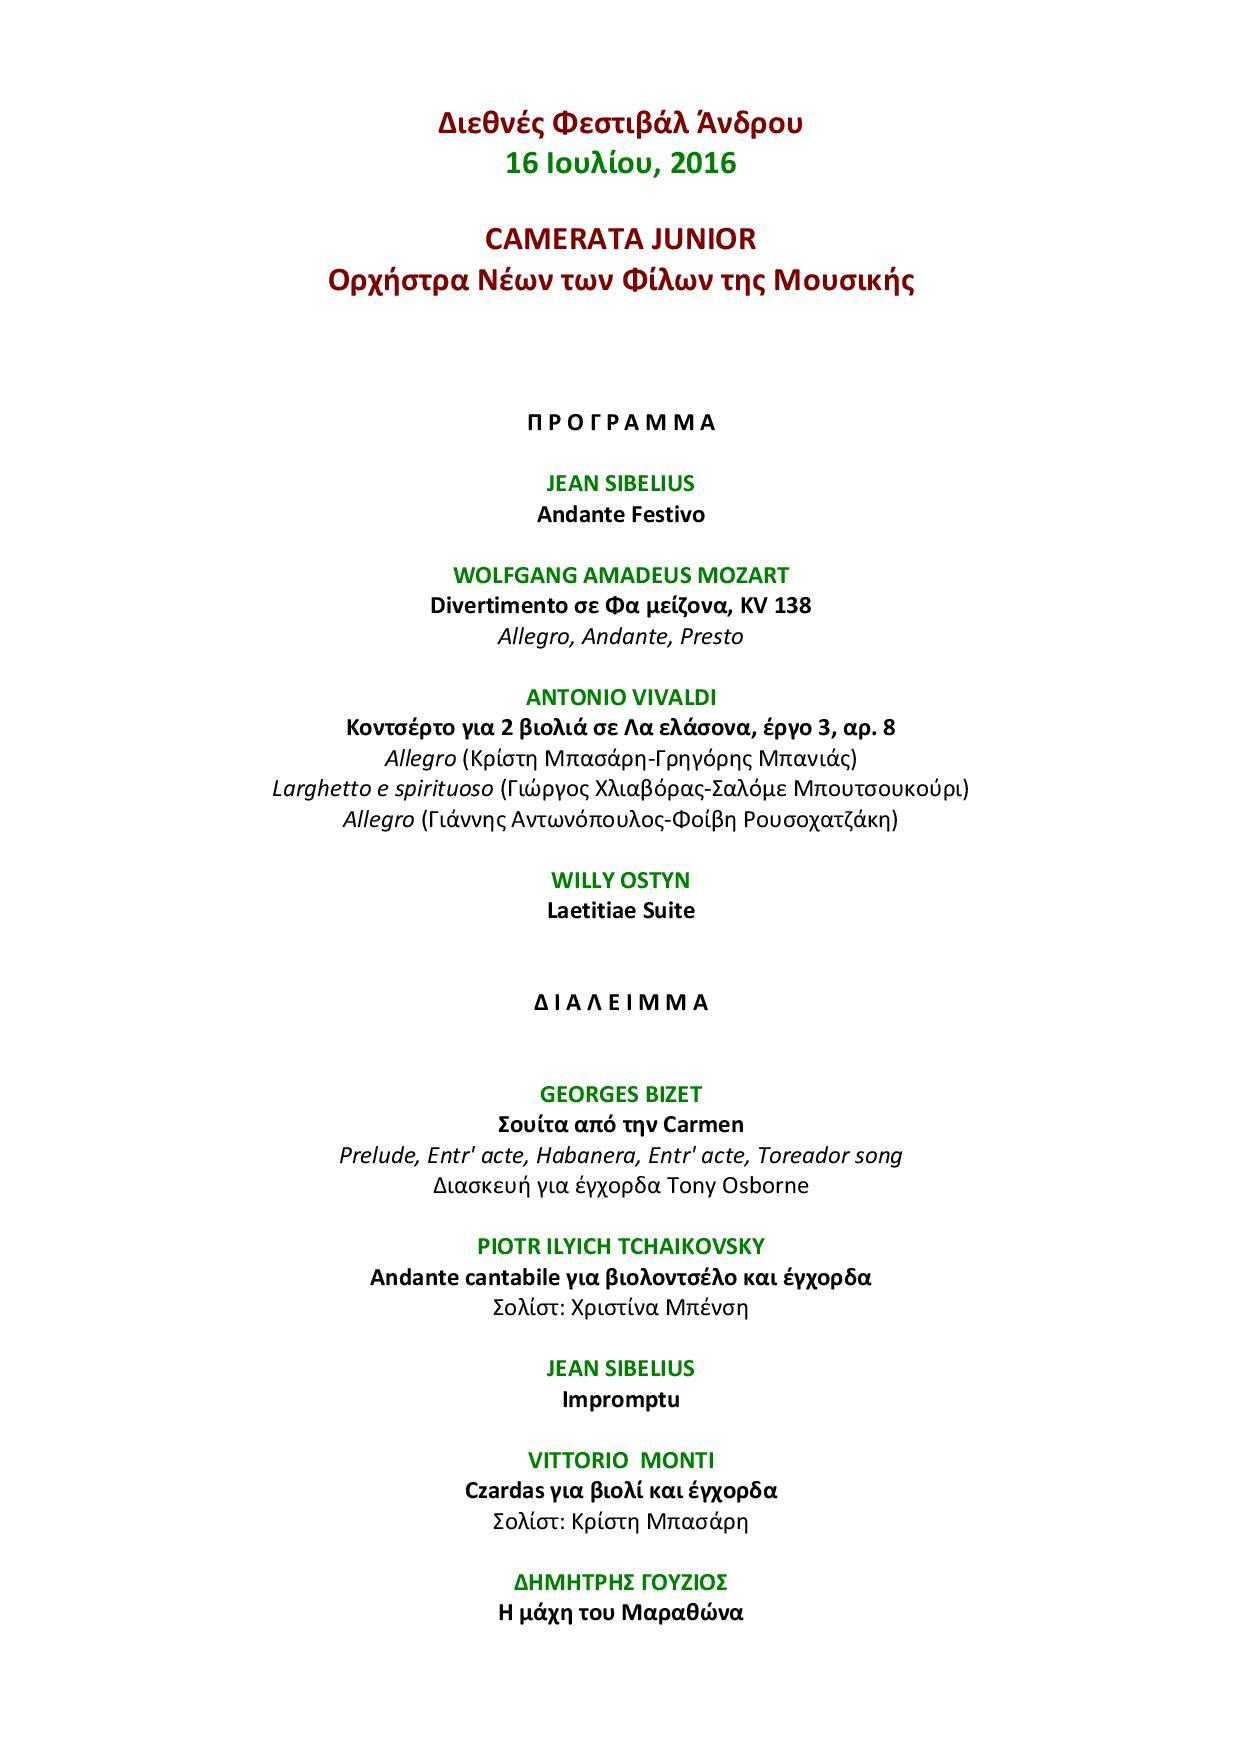 Concert program CamJunior Andros-page-001